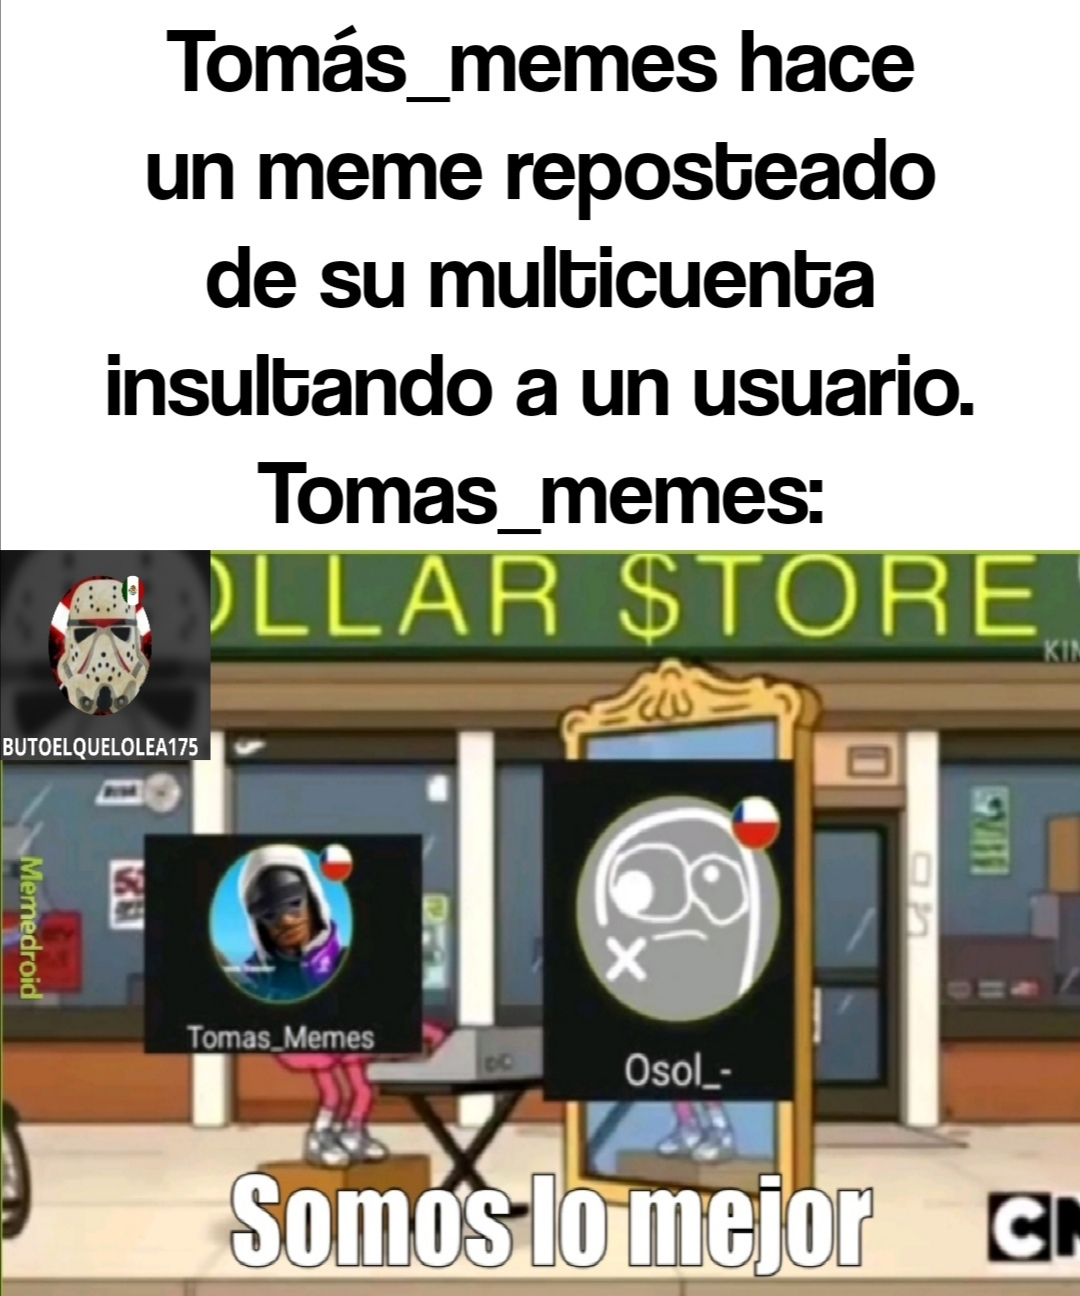 Tomás_memes in a nutshell